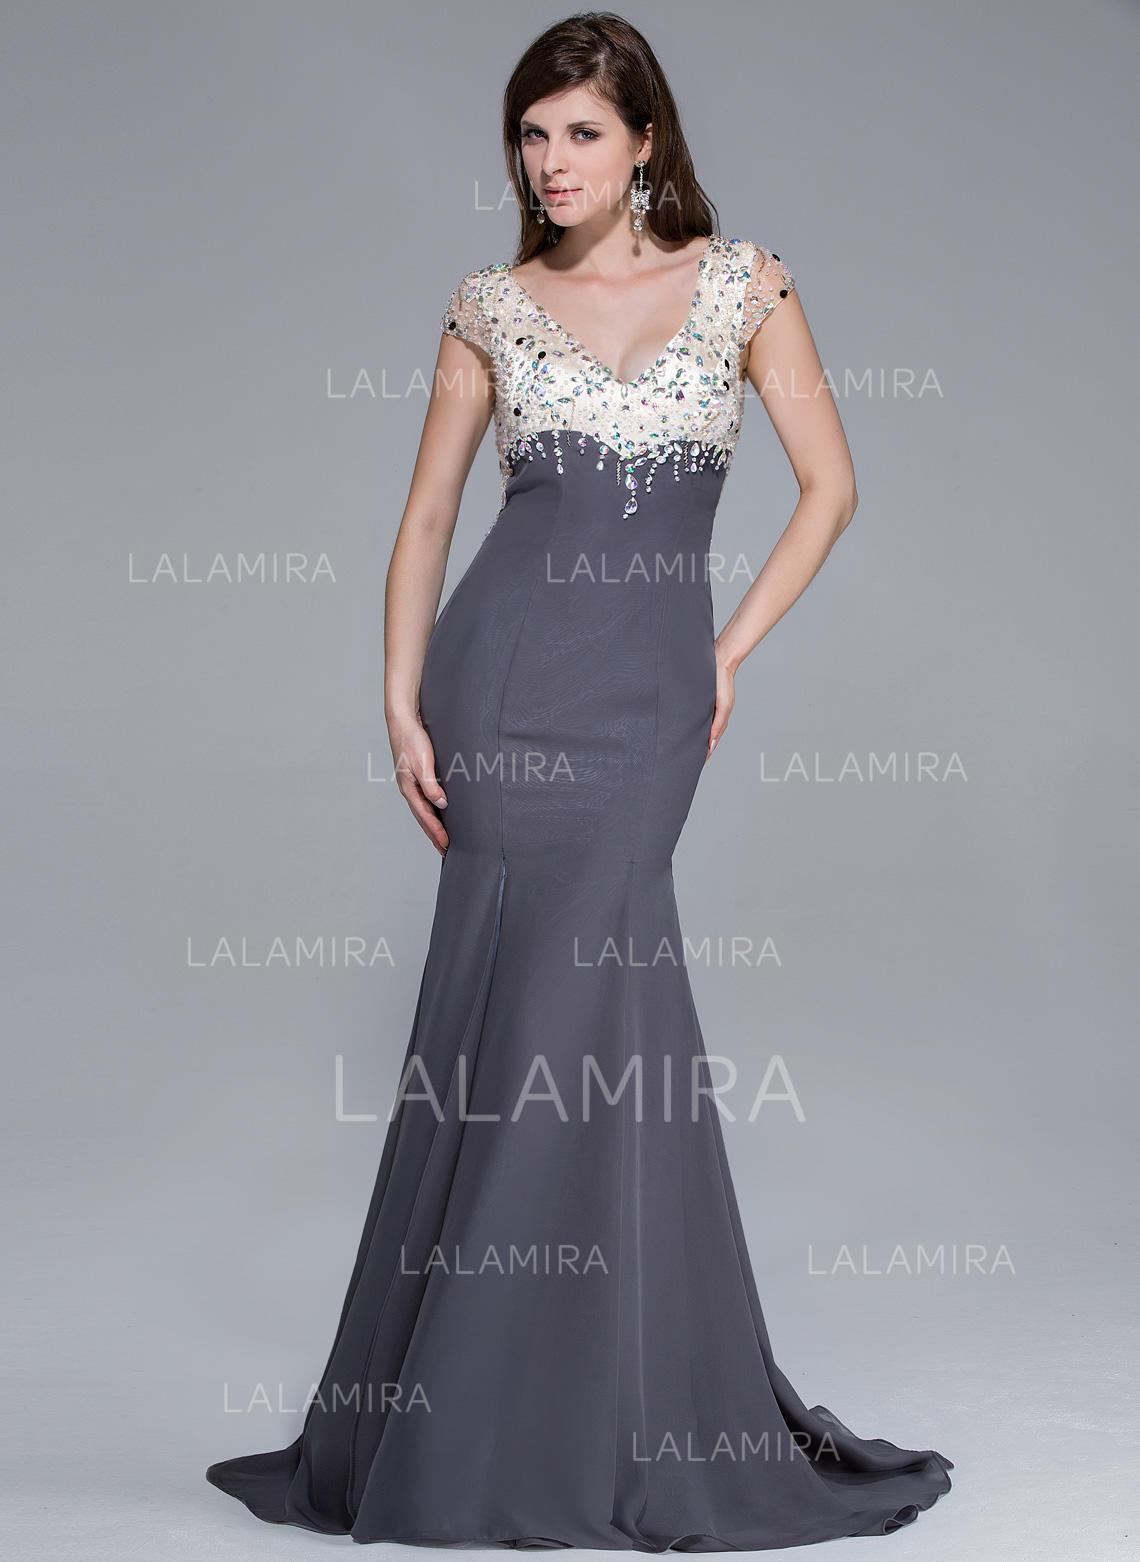 3341e4bcdf6c Trumpet/Mermaid Chiffon Charmeuse Prom Dresses Beautiful Sweep Train V-neck  Short Sleeves (. Loading zoom